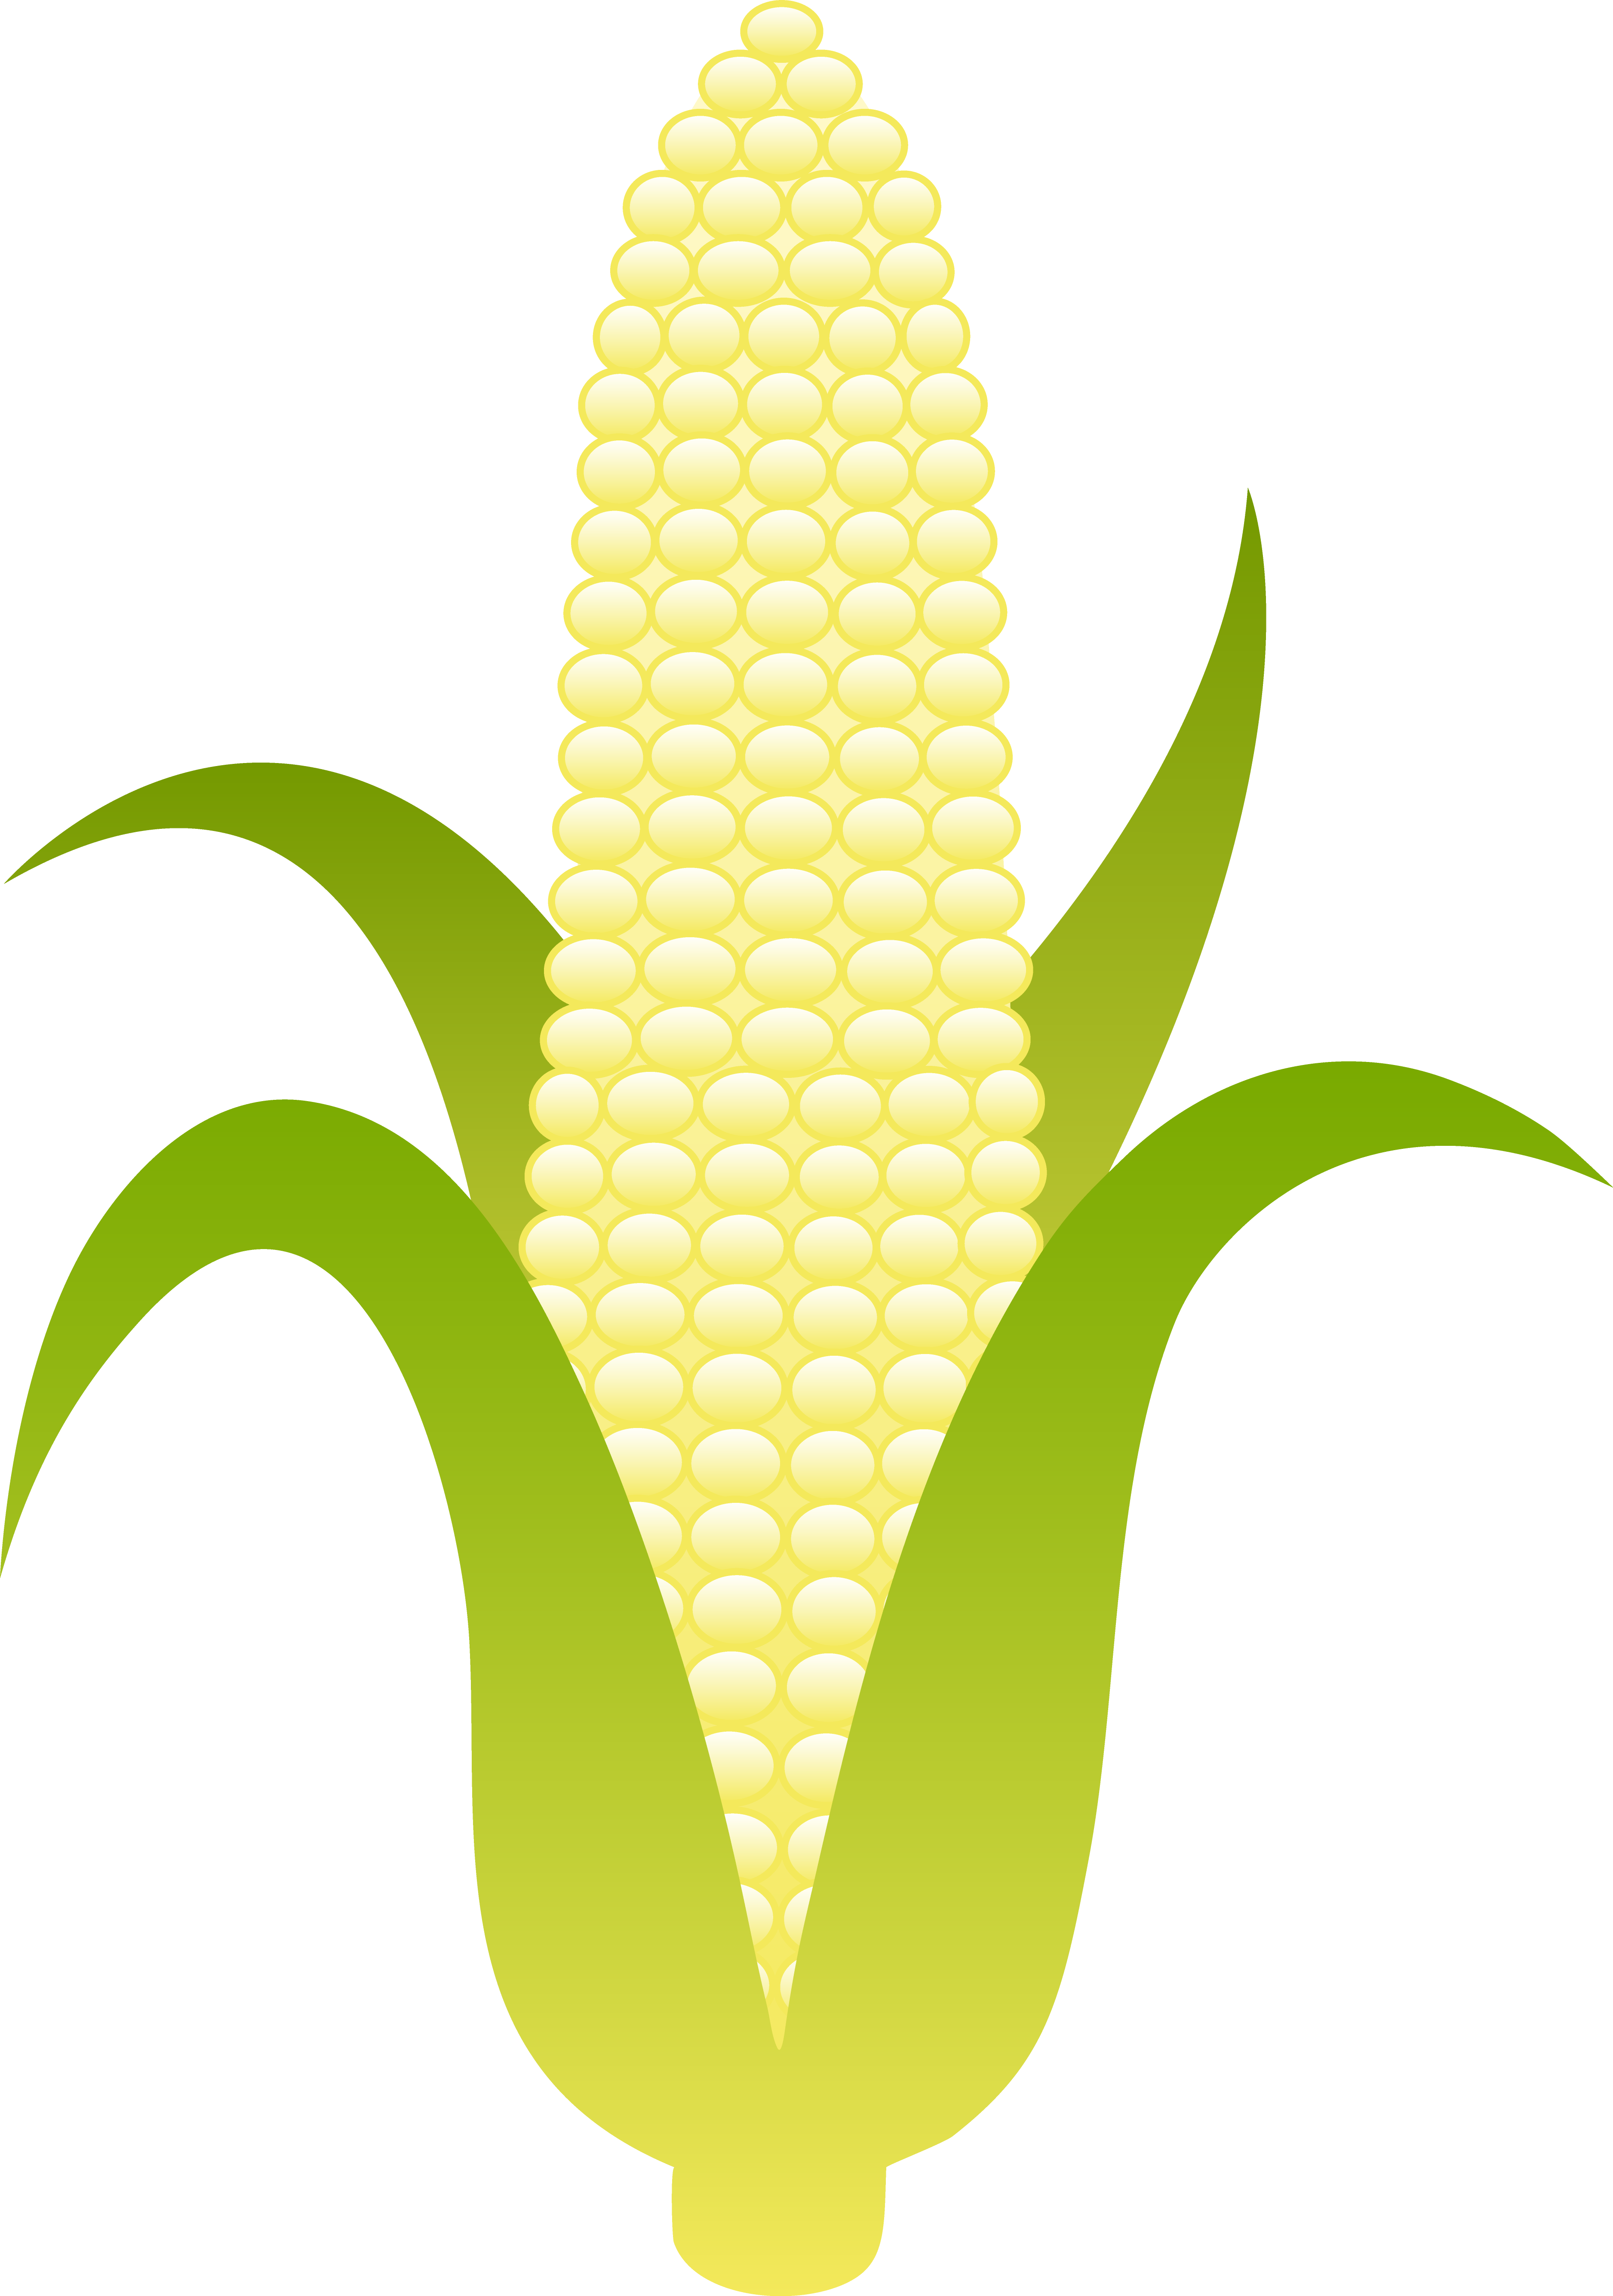 Corn clip art 3.